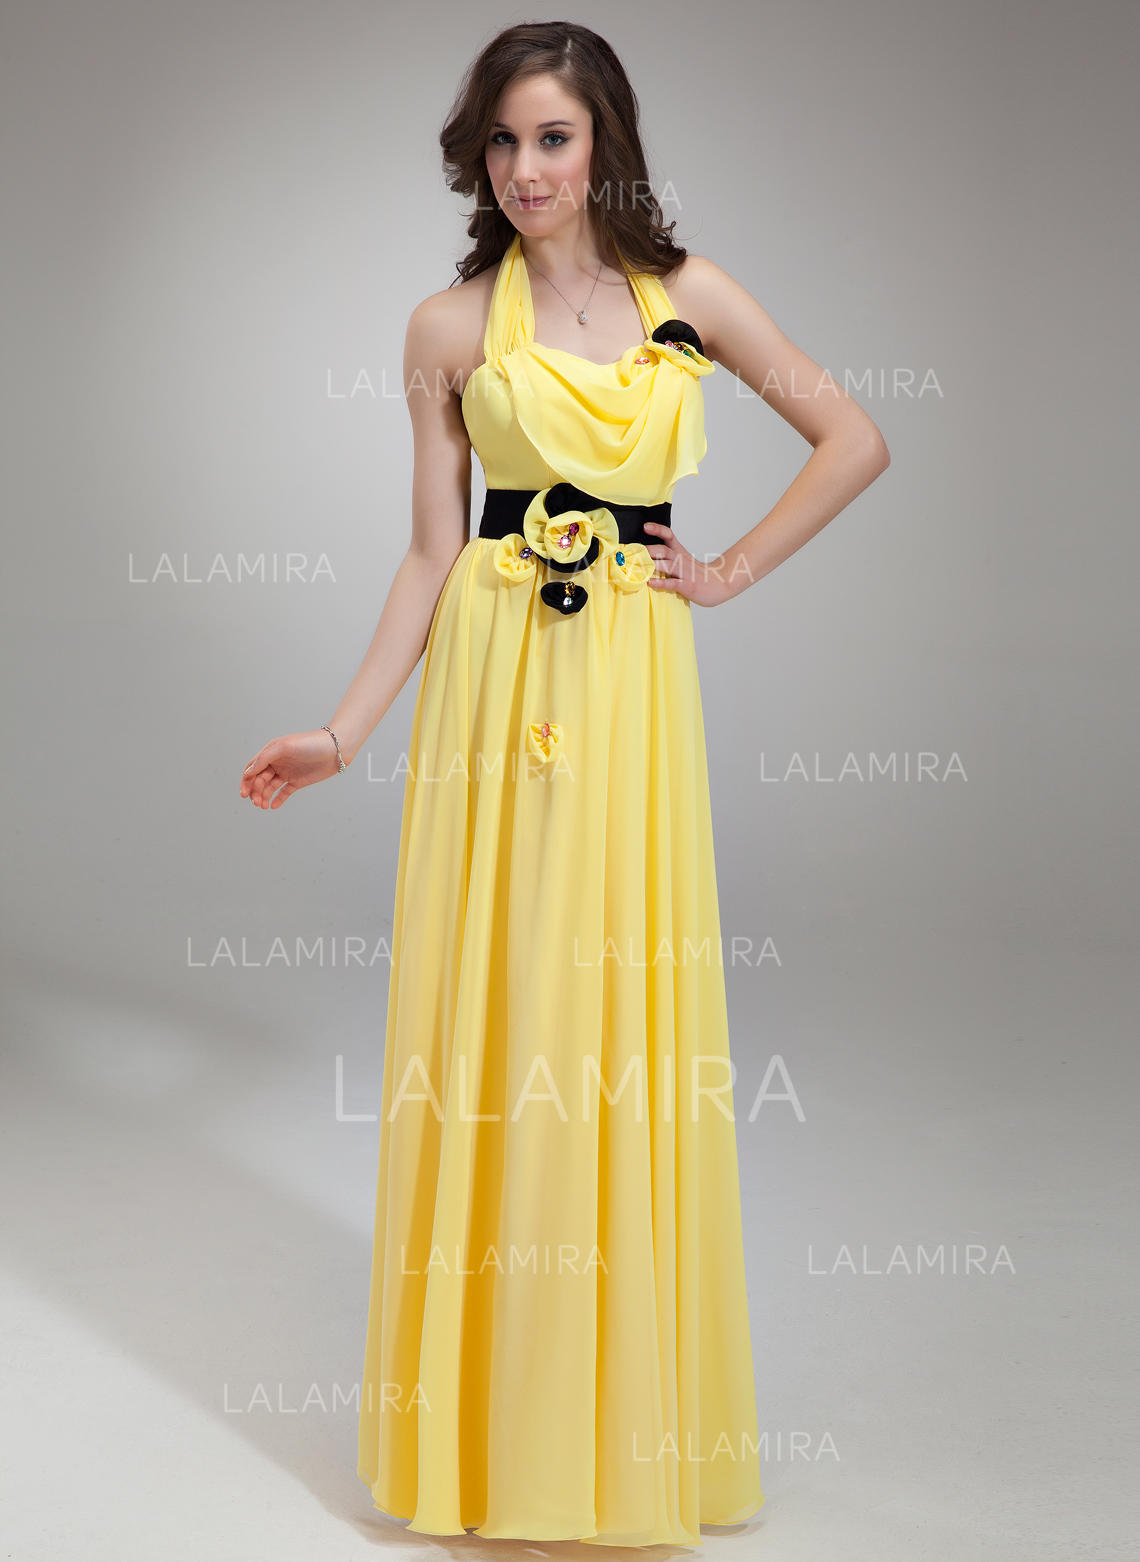 e66fcdef44e A-Line Princess Chiffon Prom Dresses Ruffle Sash Beading Halter Sleeveless  Floor-Length. Loading zoom